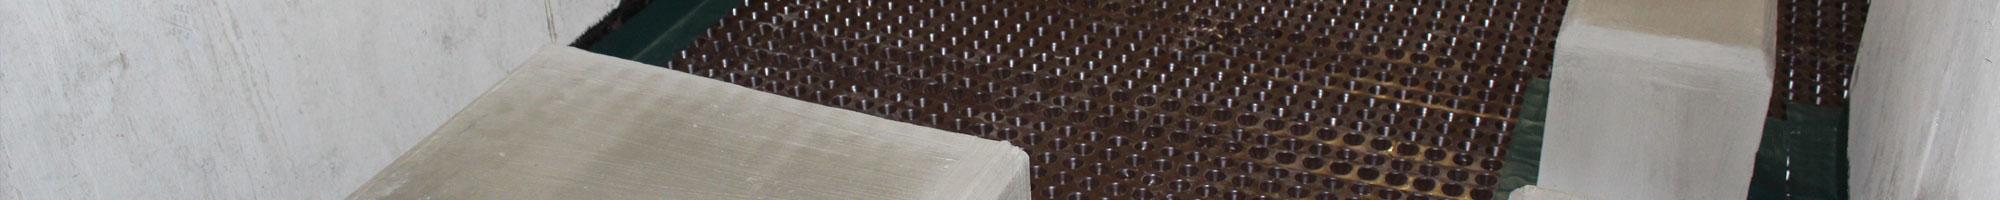 Cemplas - Banner - Basements & Waterproofing - Image 4